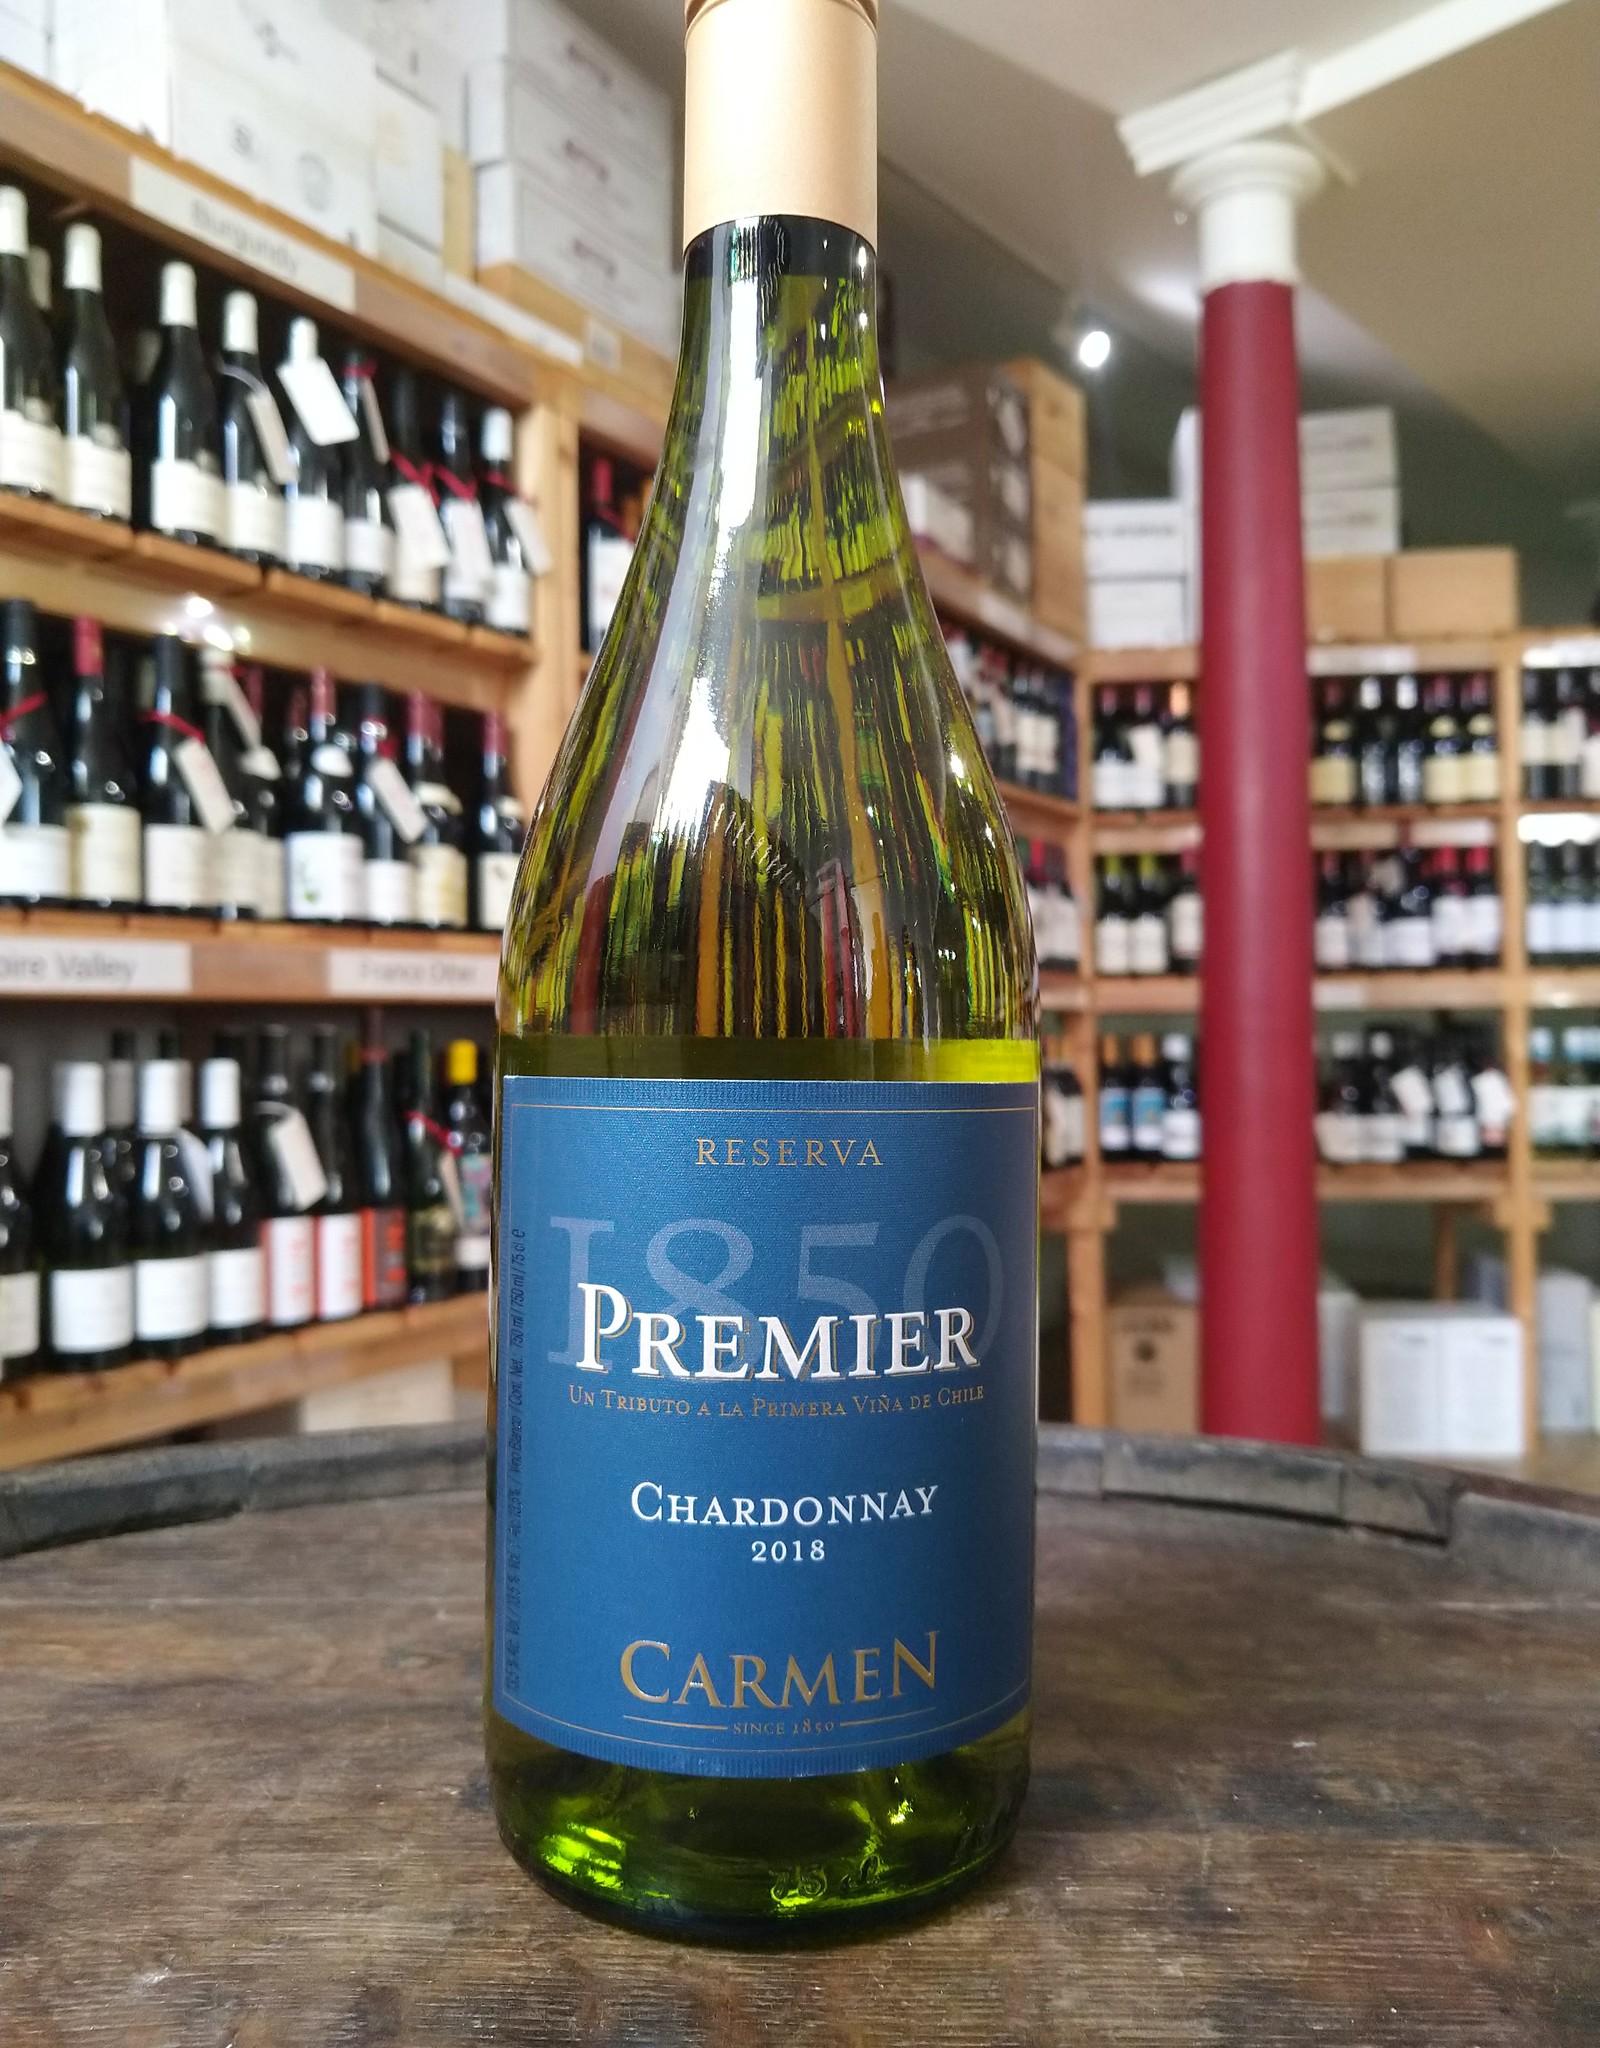 2018 Premier 1850 Chardonnay, Carmen